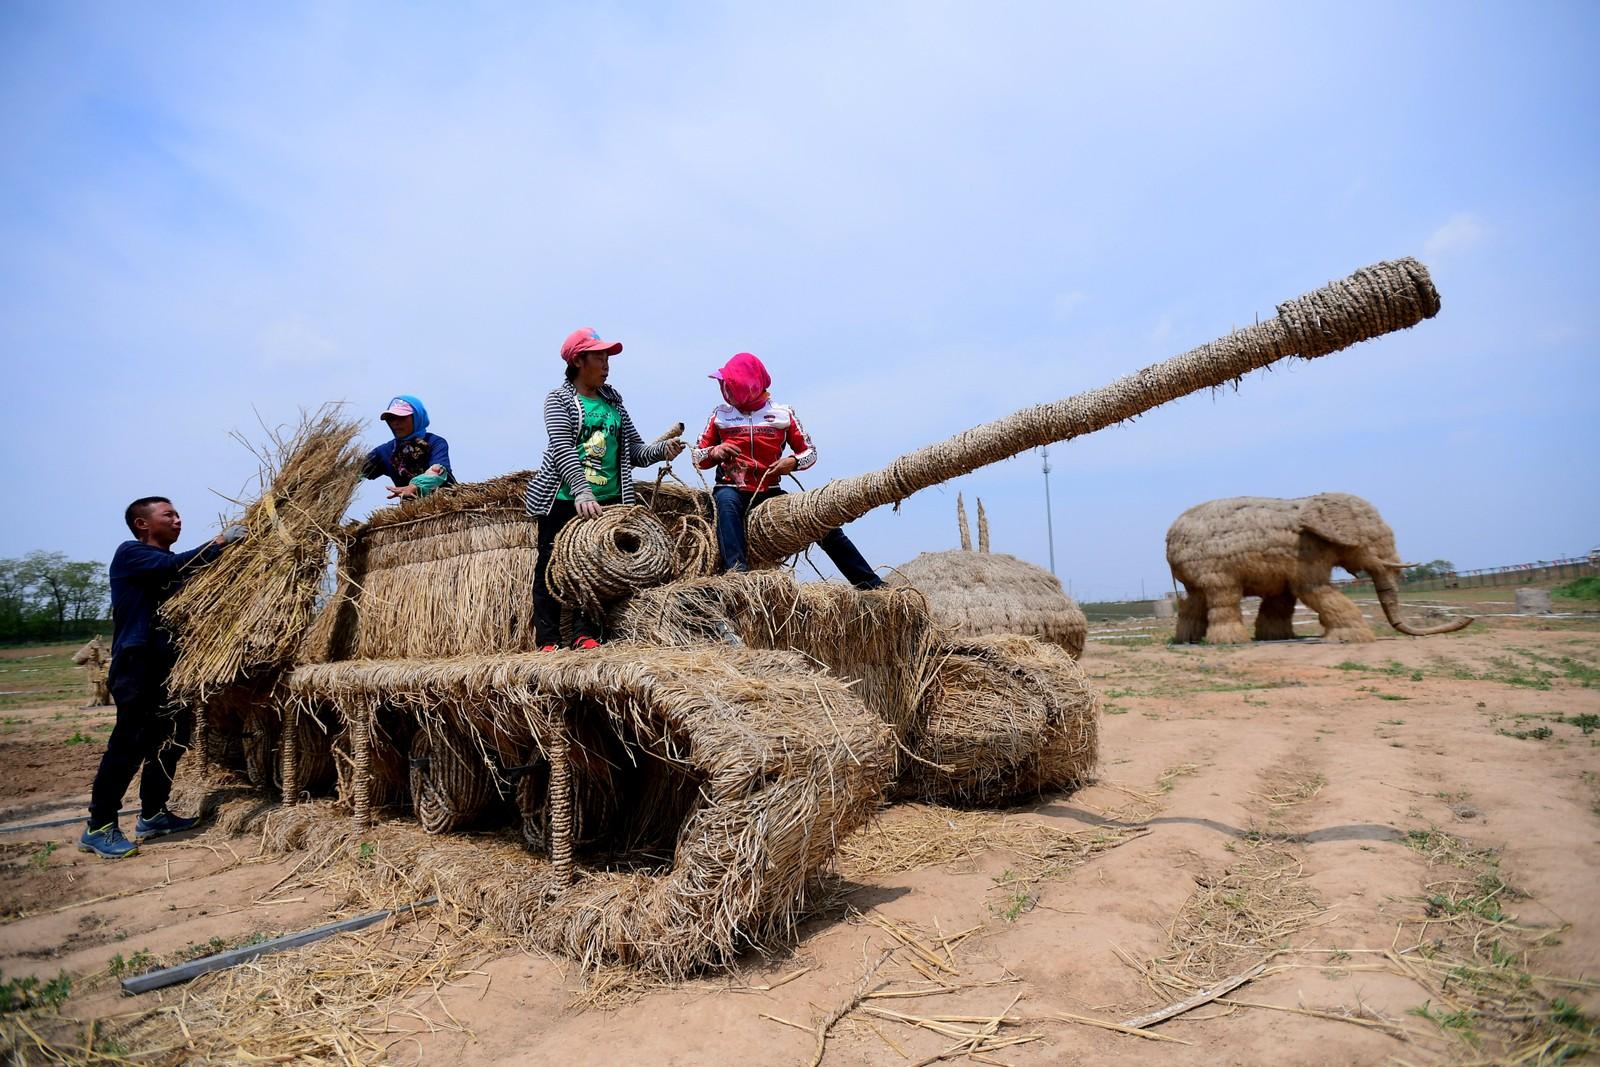 En tank, en elefant, en kenguru og fly. I forbindelse med en utstilling har kinesiske bønder i Liaoning-provinsen, Kina laga blant annet disse figurene.